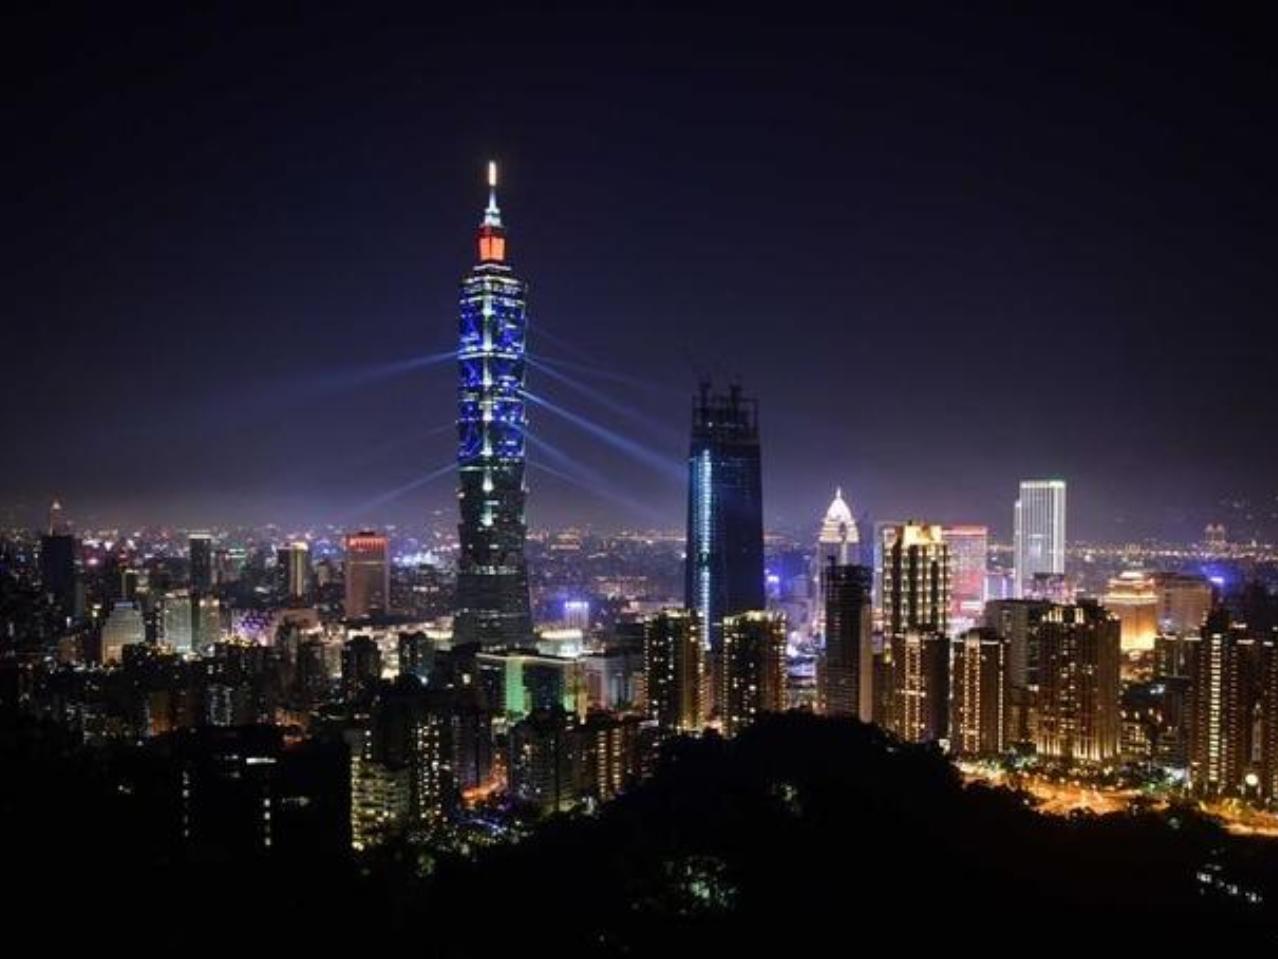 China closely watches US warship sailing through Taiwan Strait: spokesman